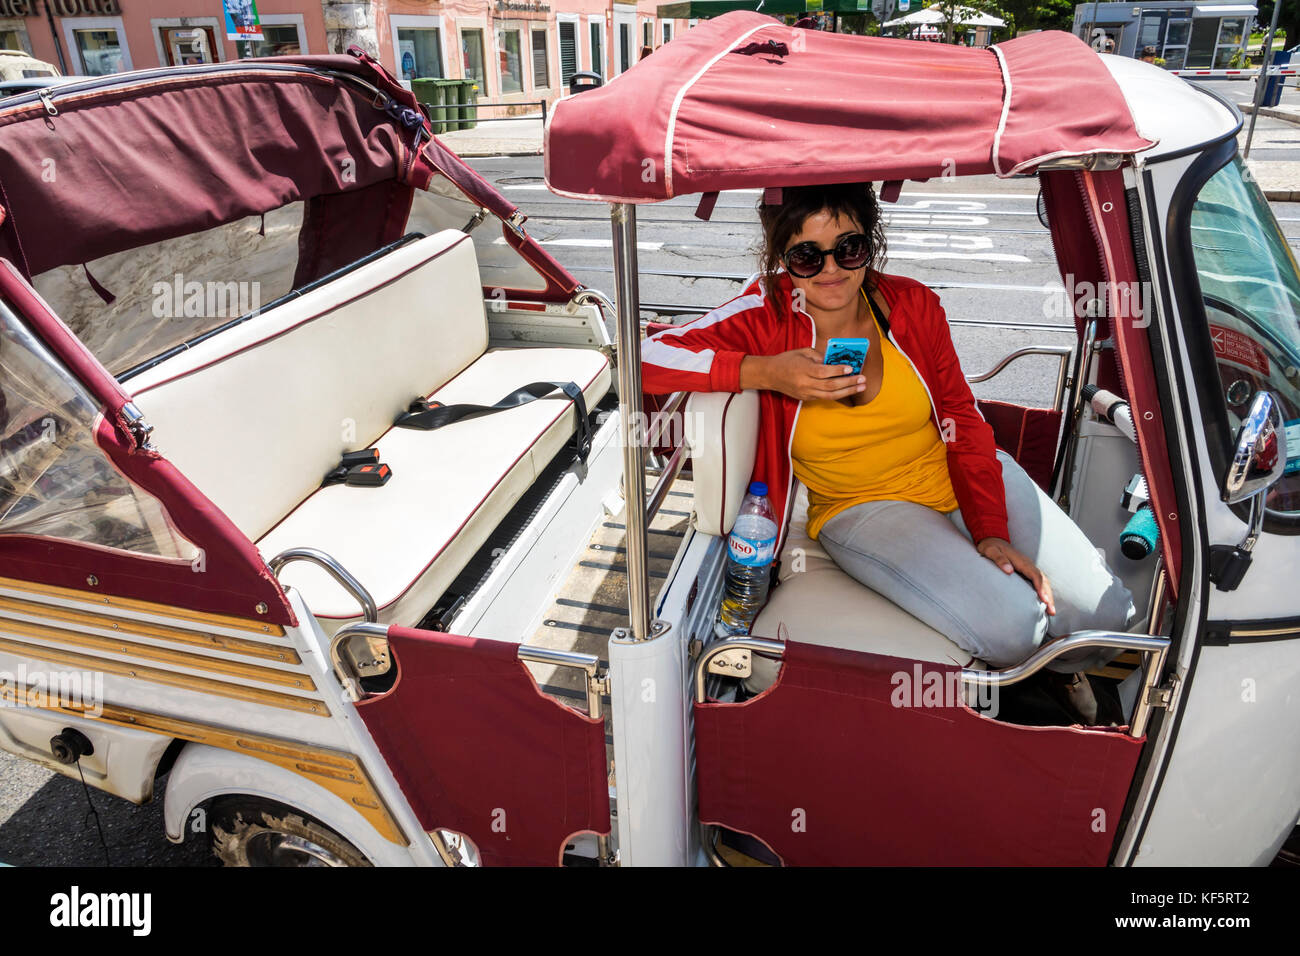 Lisbon Portugal Belem historic district Rua de Belem tuk-tuk tricycle cycle rickshaw woman driver waiting smartphone - Stock Image